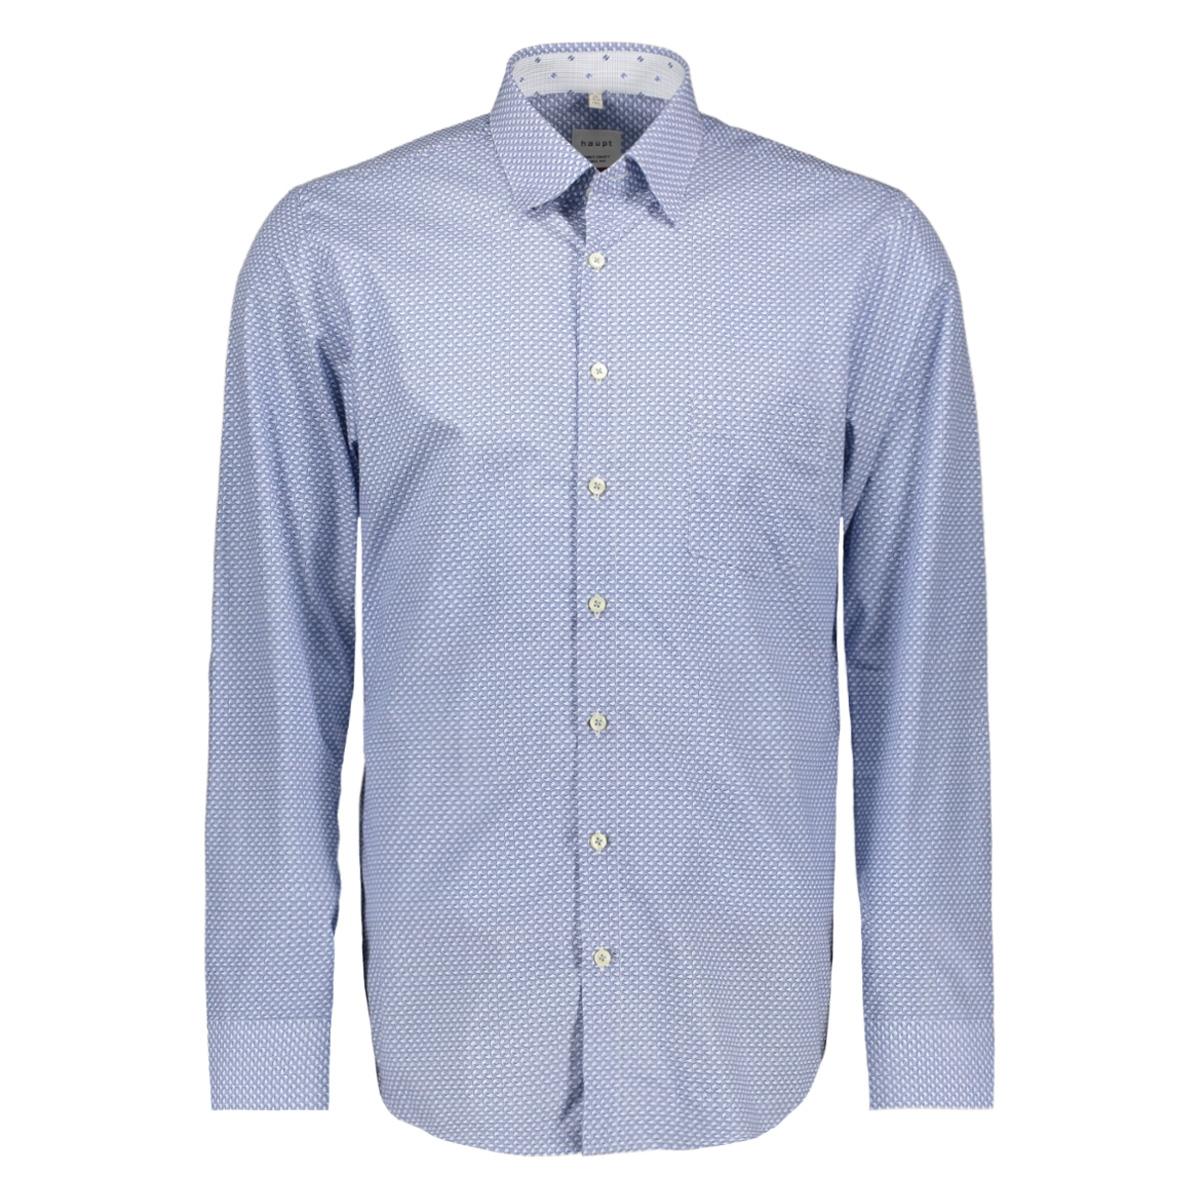 2270 7058 haupt overhemd 01